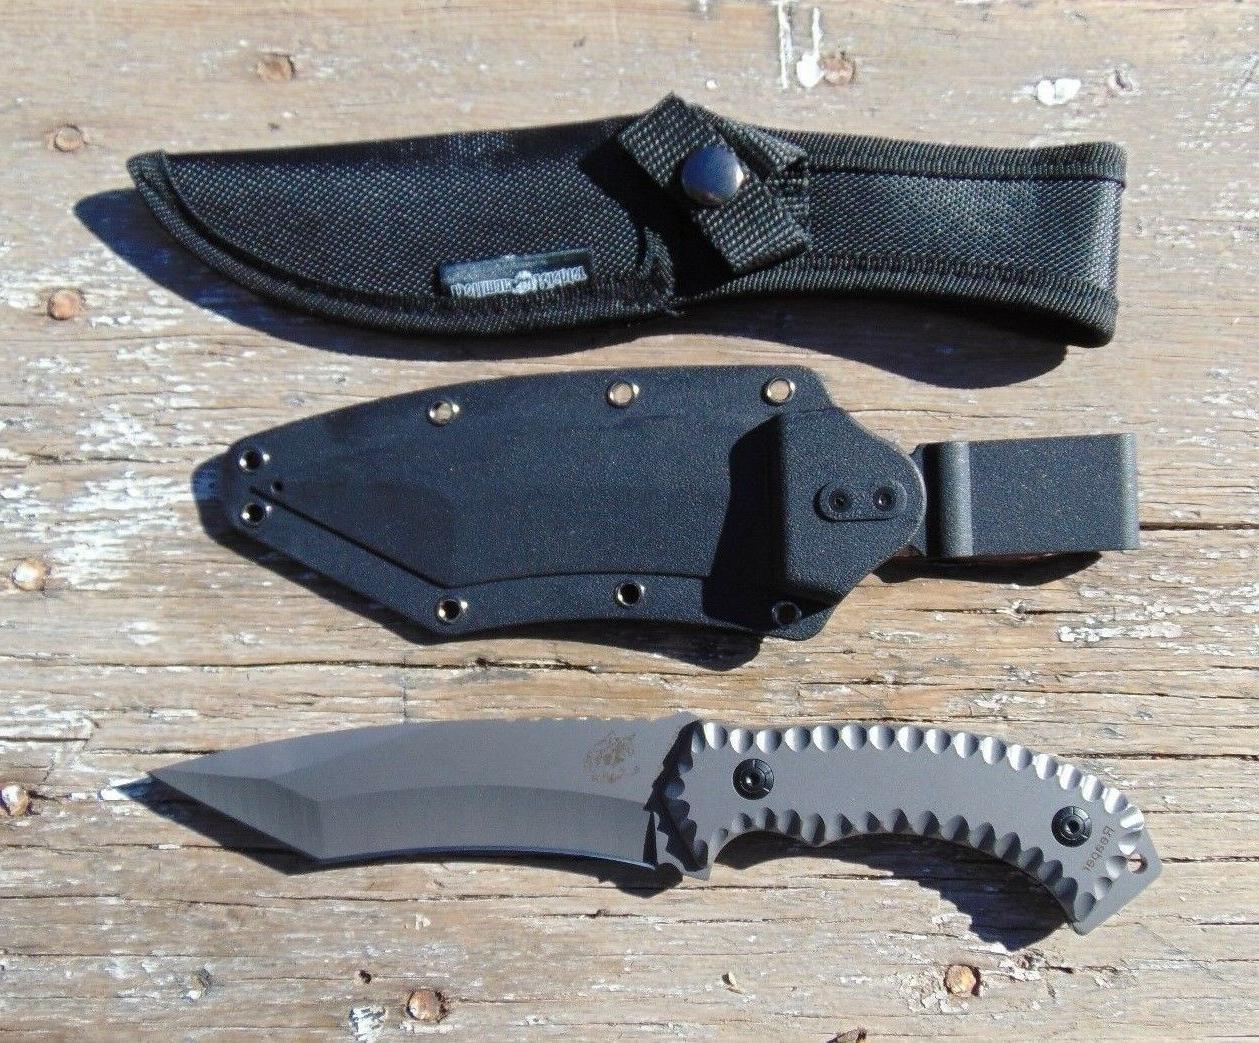 "Hoffman ""Reaper Survival Limited knife"